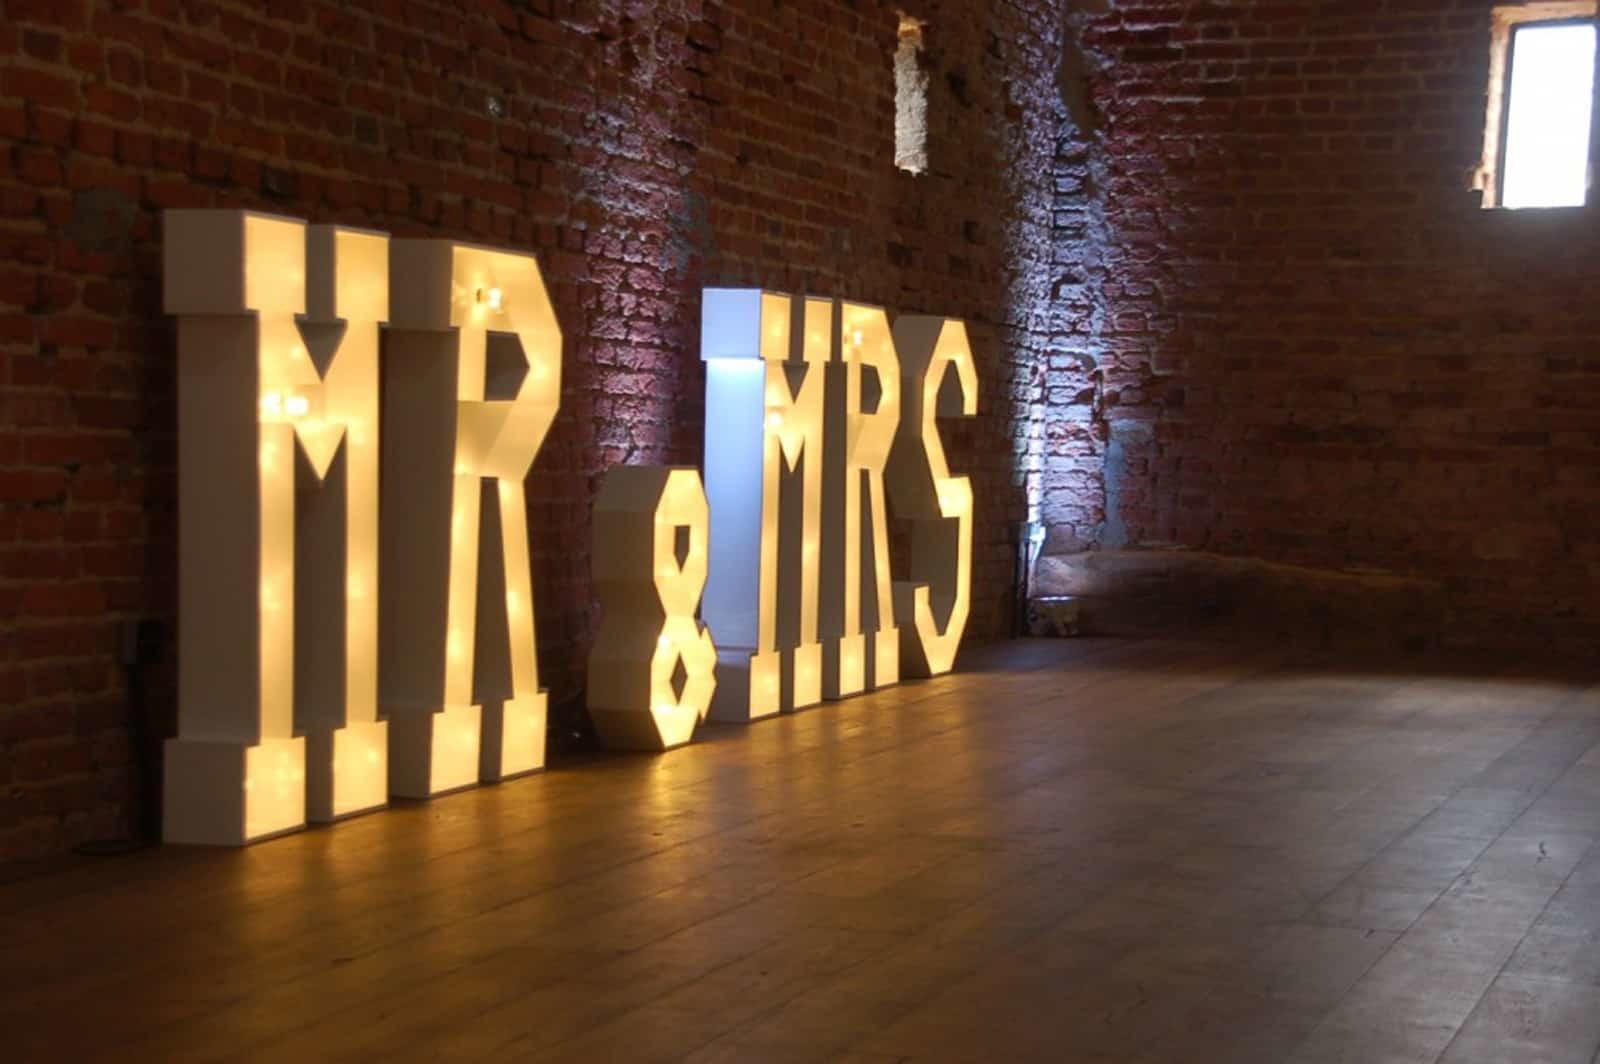 Mr & Mrs in lights